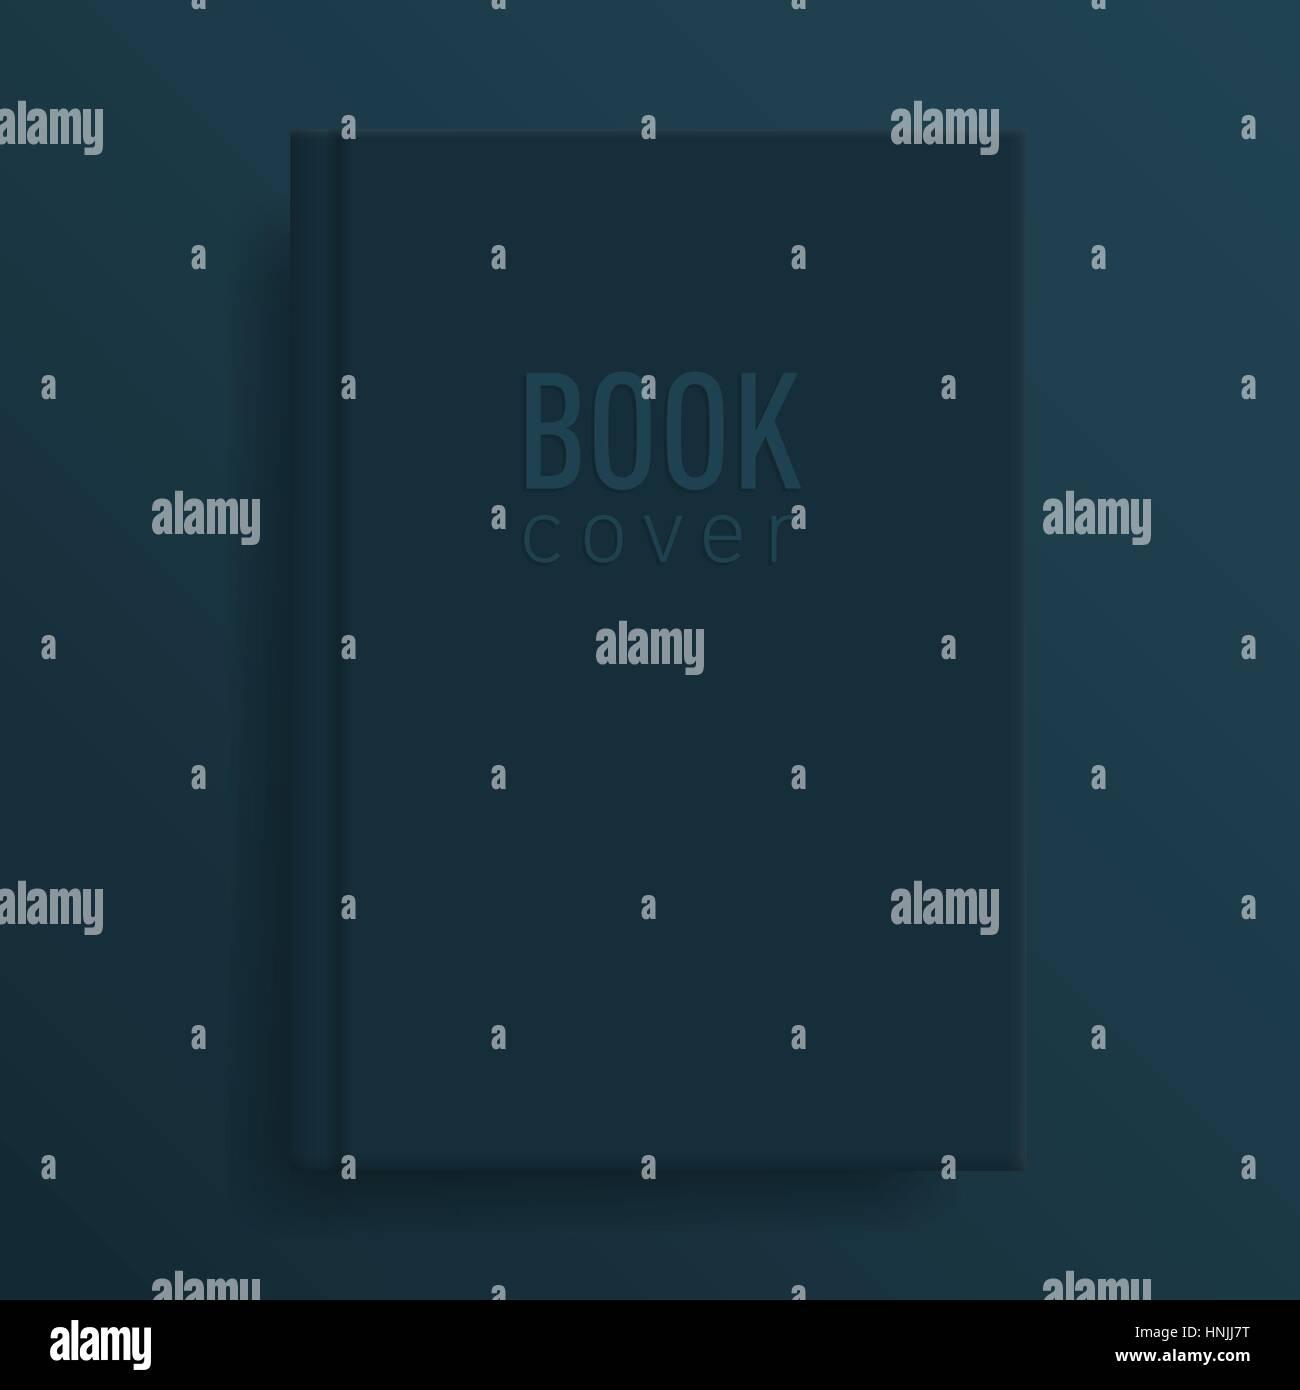 Book Cover Mockup Deep Indigo Colour Blank Template Idea For Diary Or Textbook Design School Educational Institution Vector Illustrat